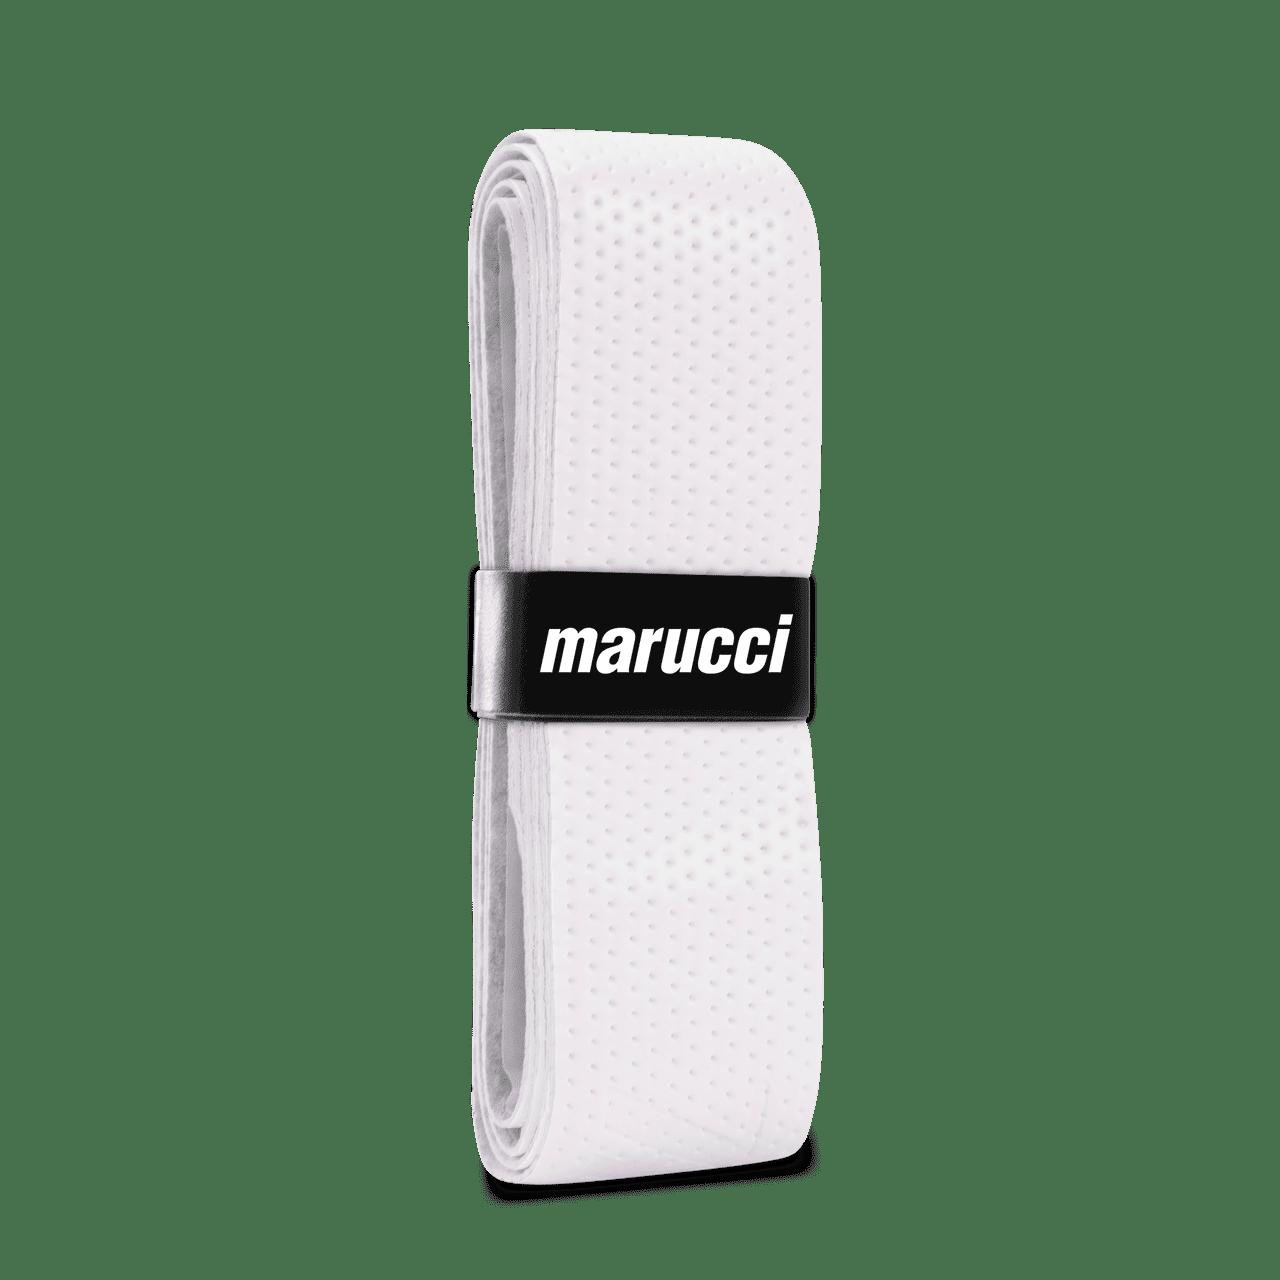 Marucci Bat Grip 1.00 mm - Gray Marble